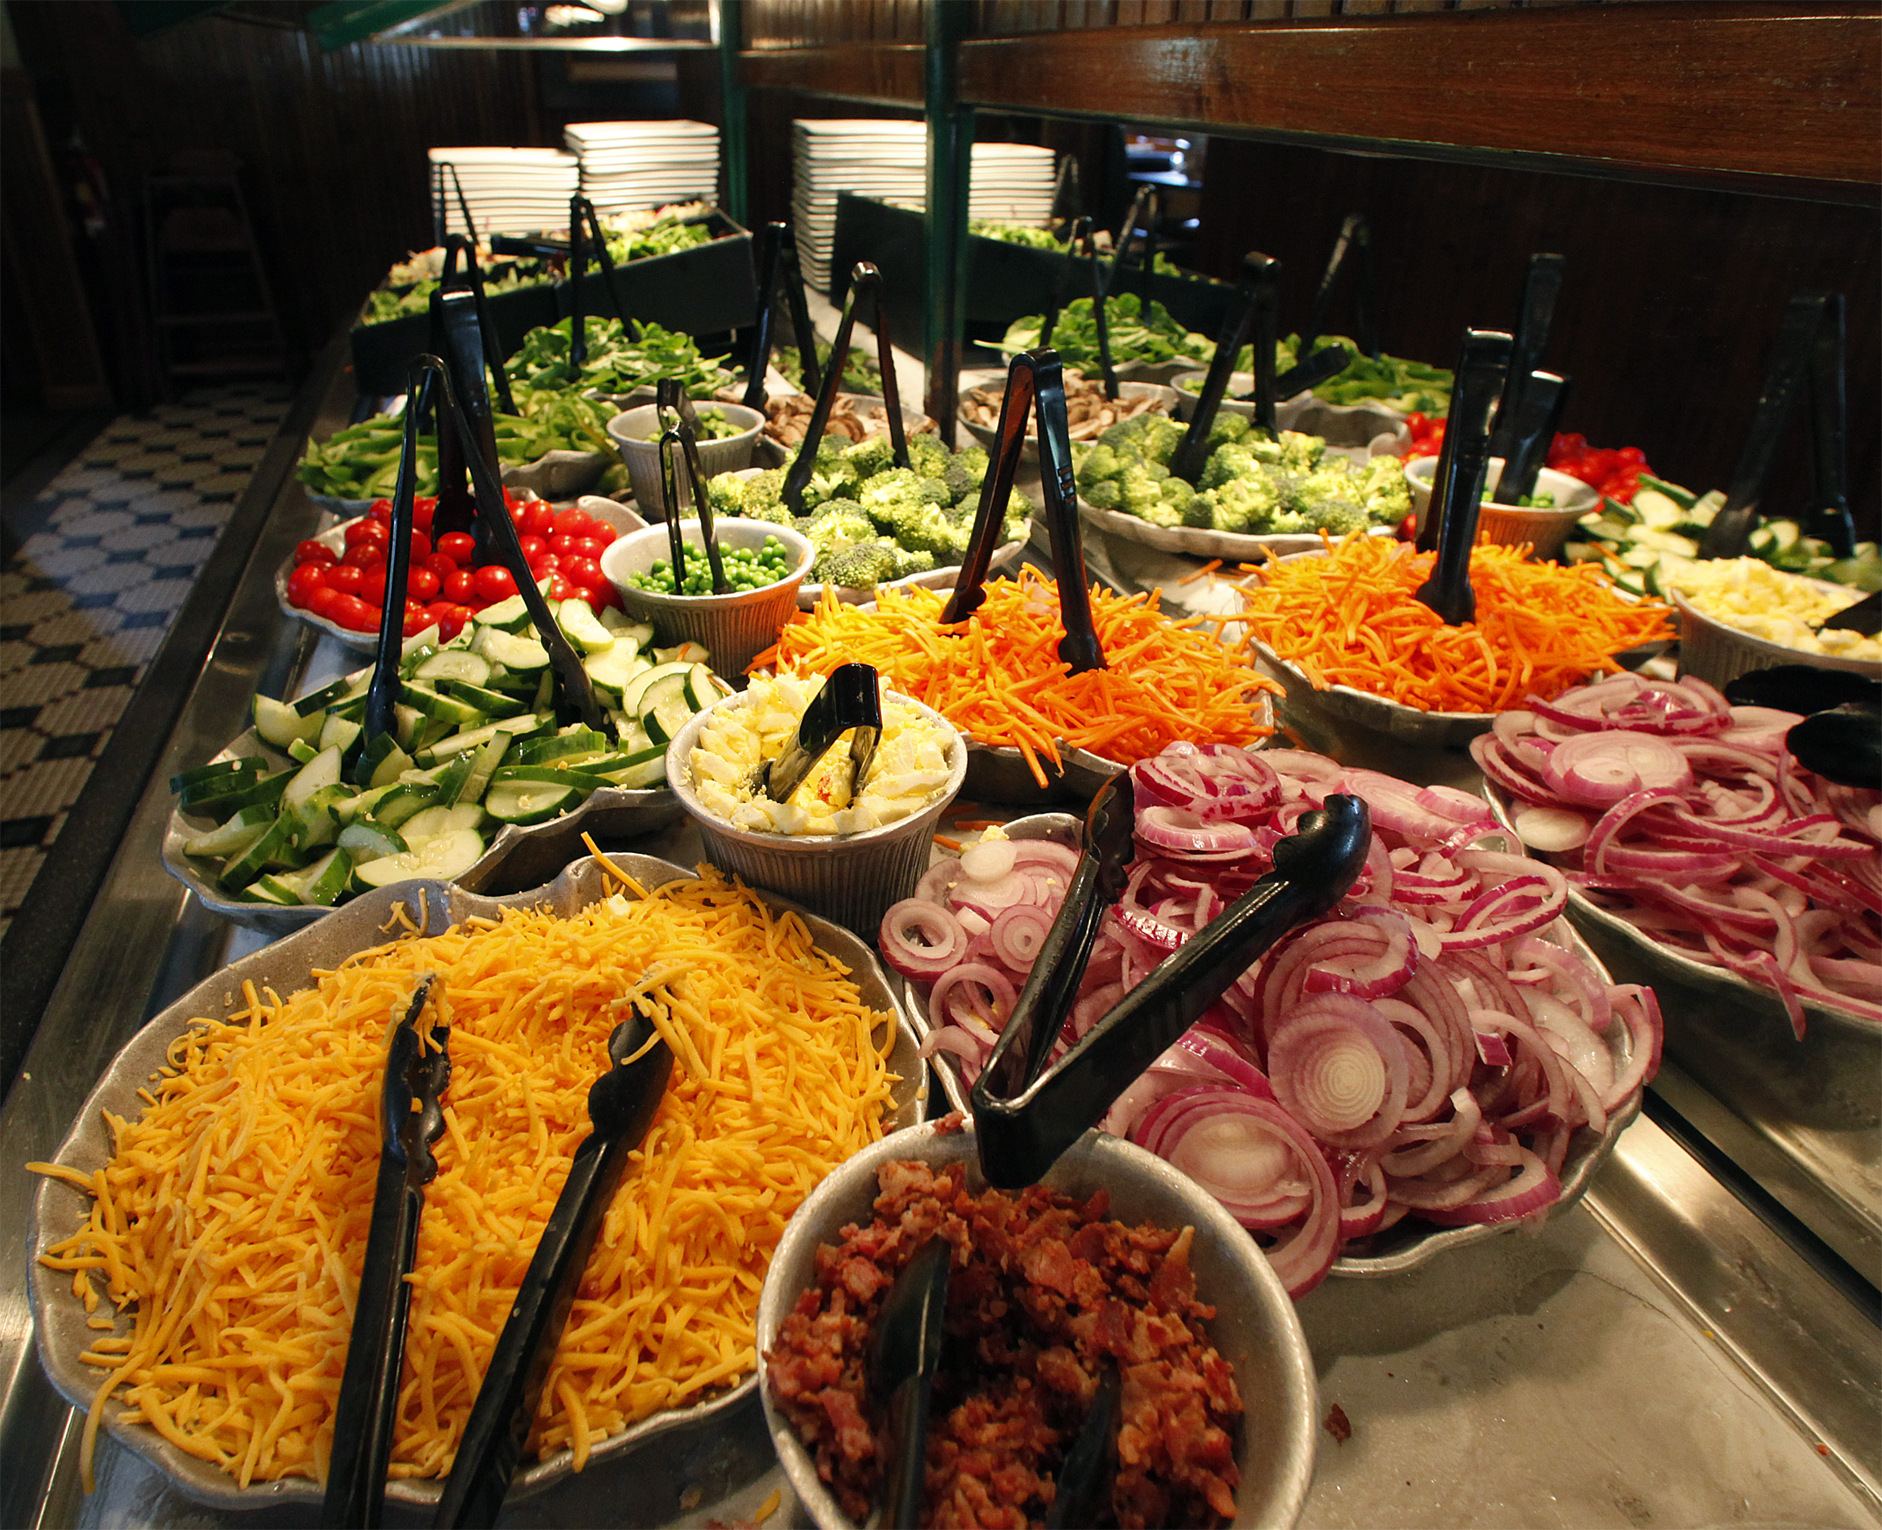 Endurance Hour Salad Bar